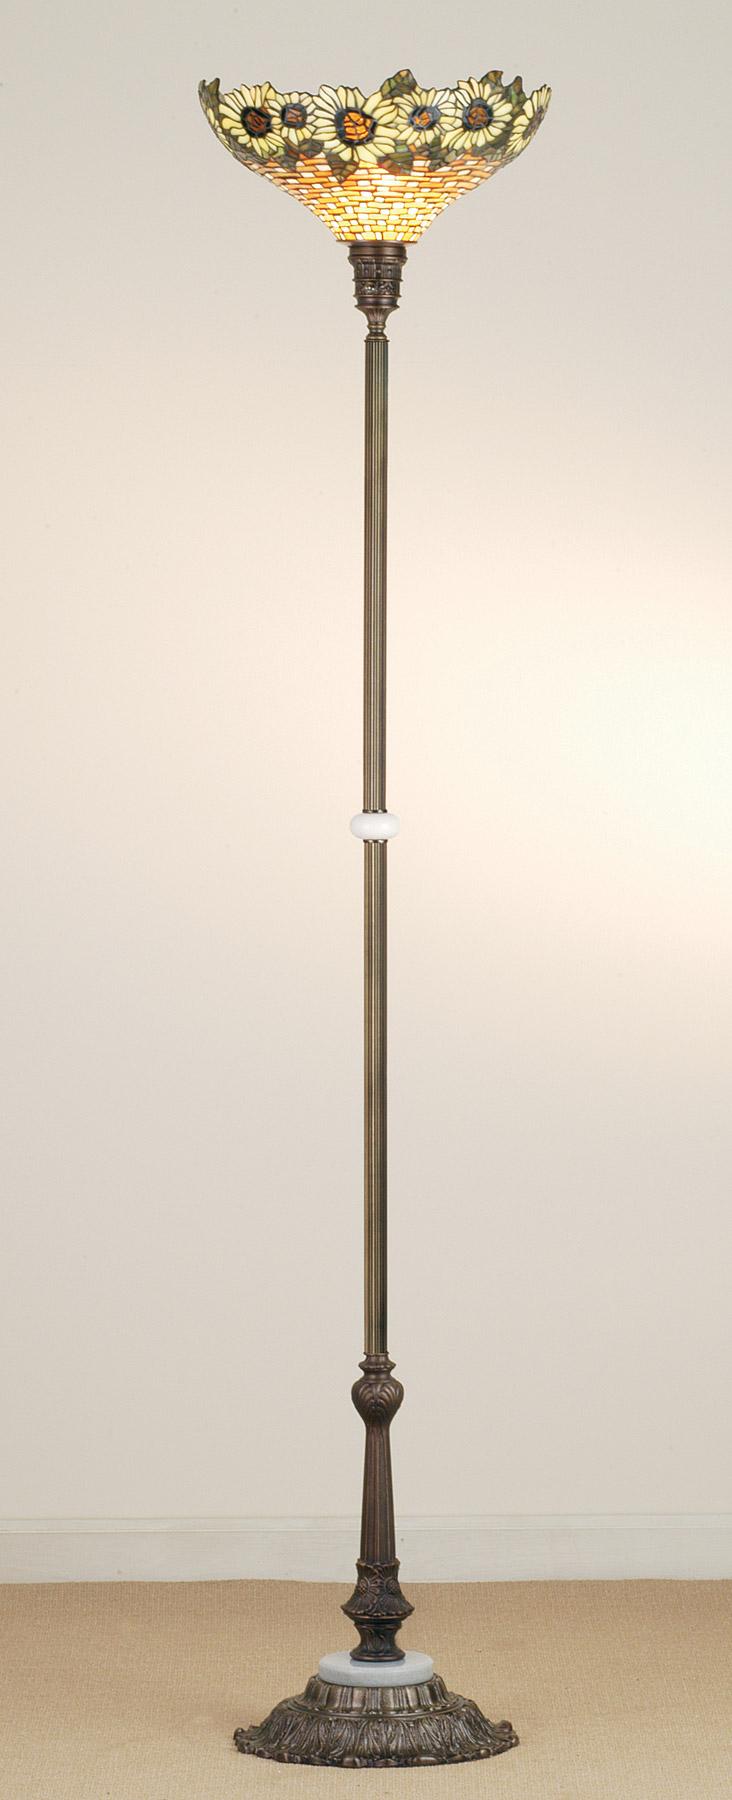 home lamps floor lamps torchiere meyda 65837. Black Bedroom Furniture Sets. Home Design Ideas